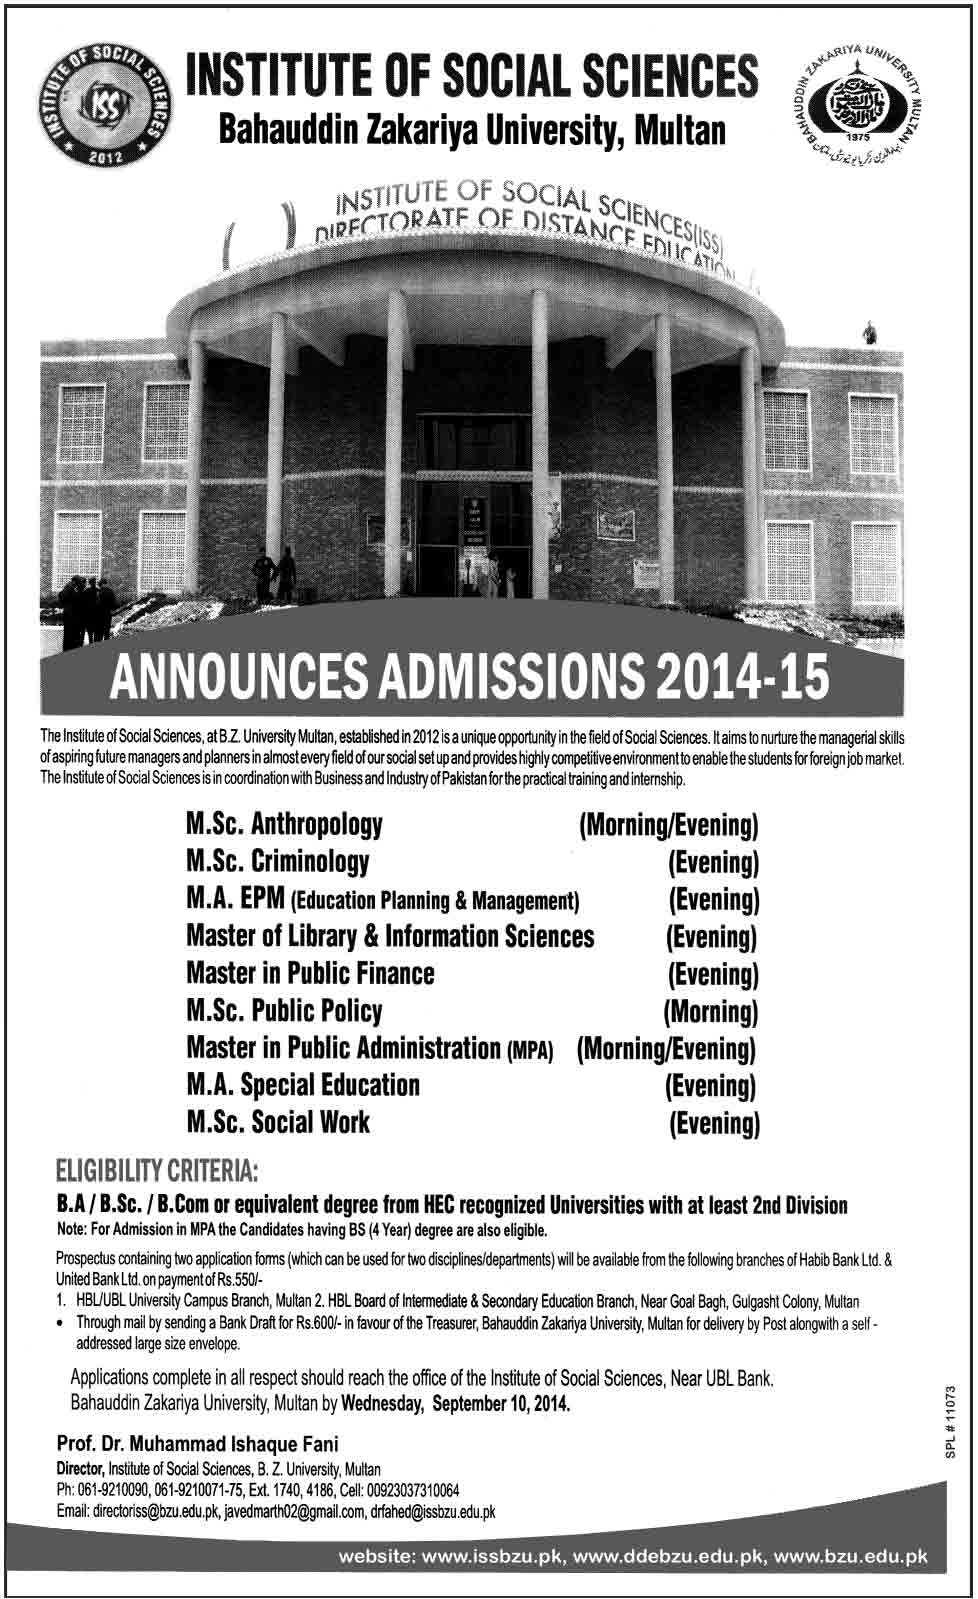 Multan Admissions 2014 Bahauddin Zakariya University Multan Admissions 2015